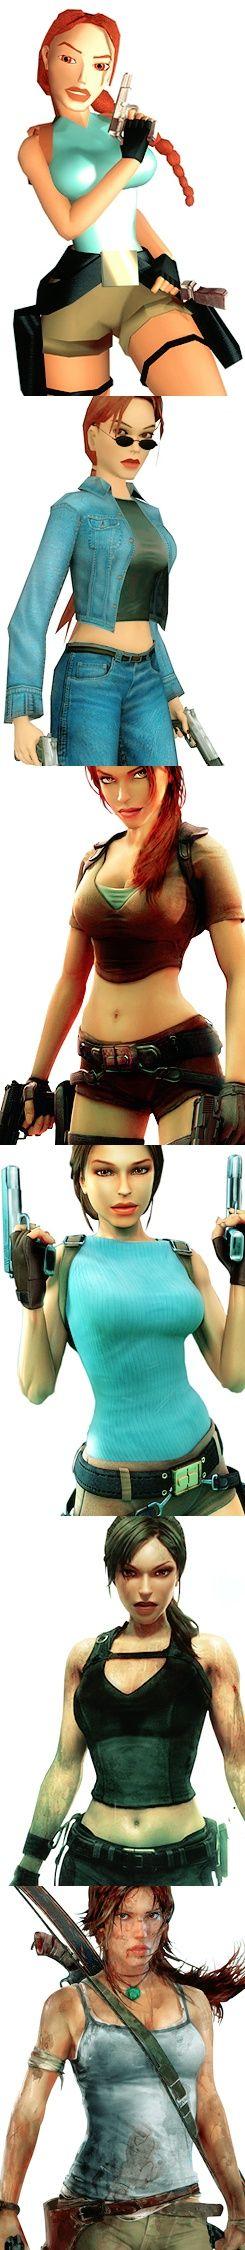 Lara Croft - Evolution - Now that's better!